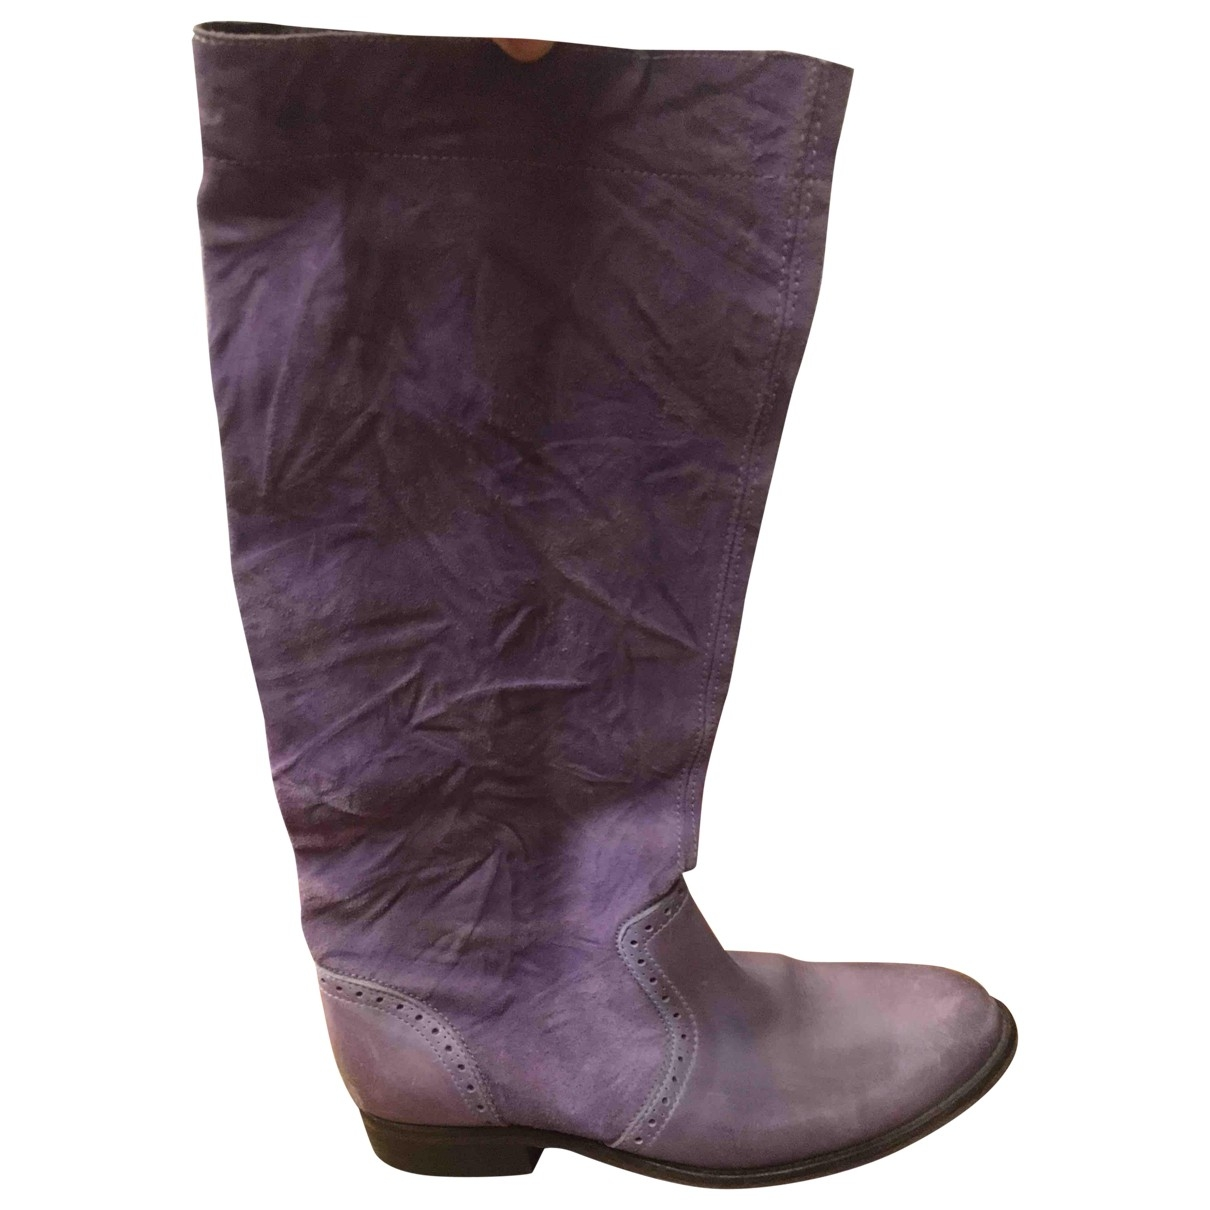 Diesel - Bottes   pour femme en suede - violet